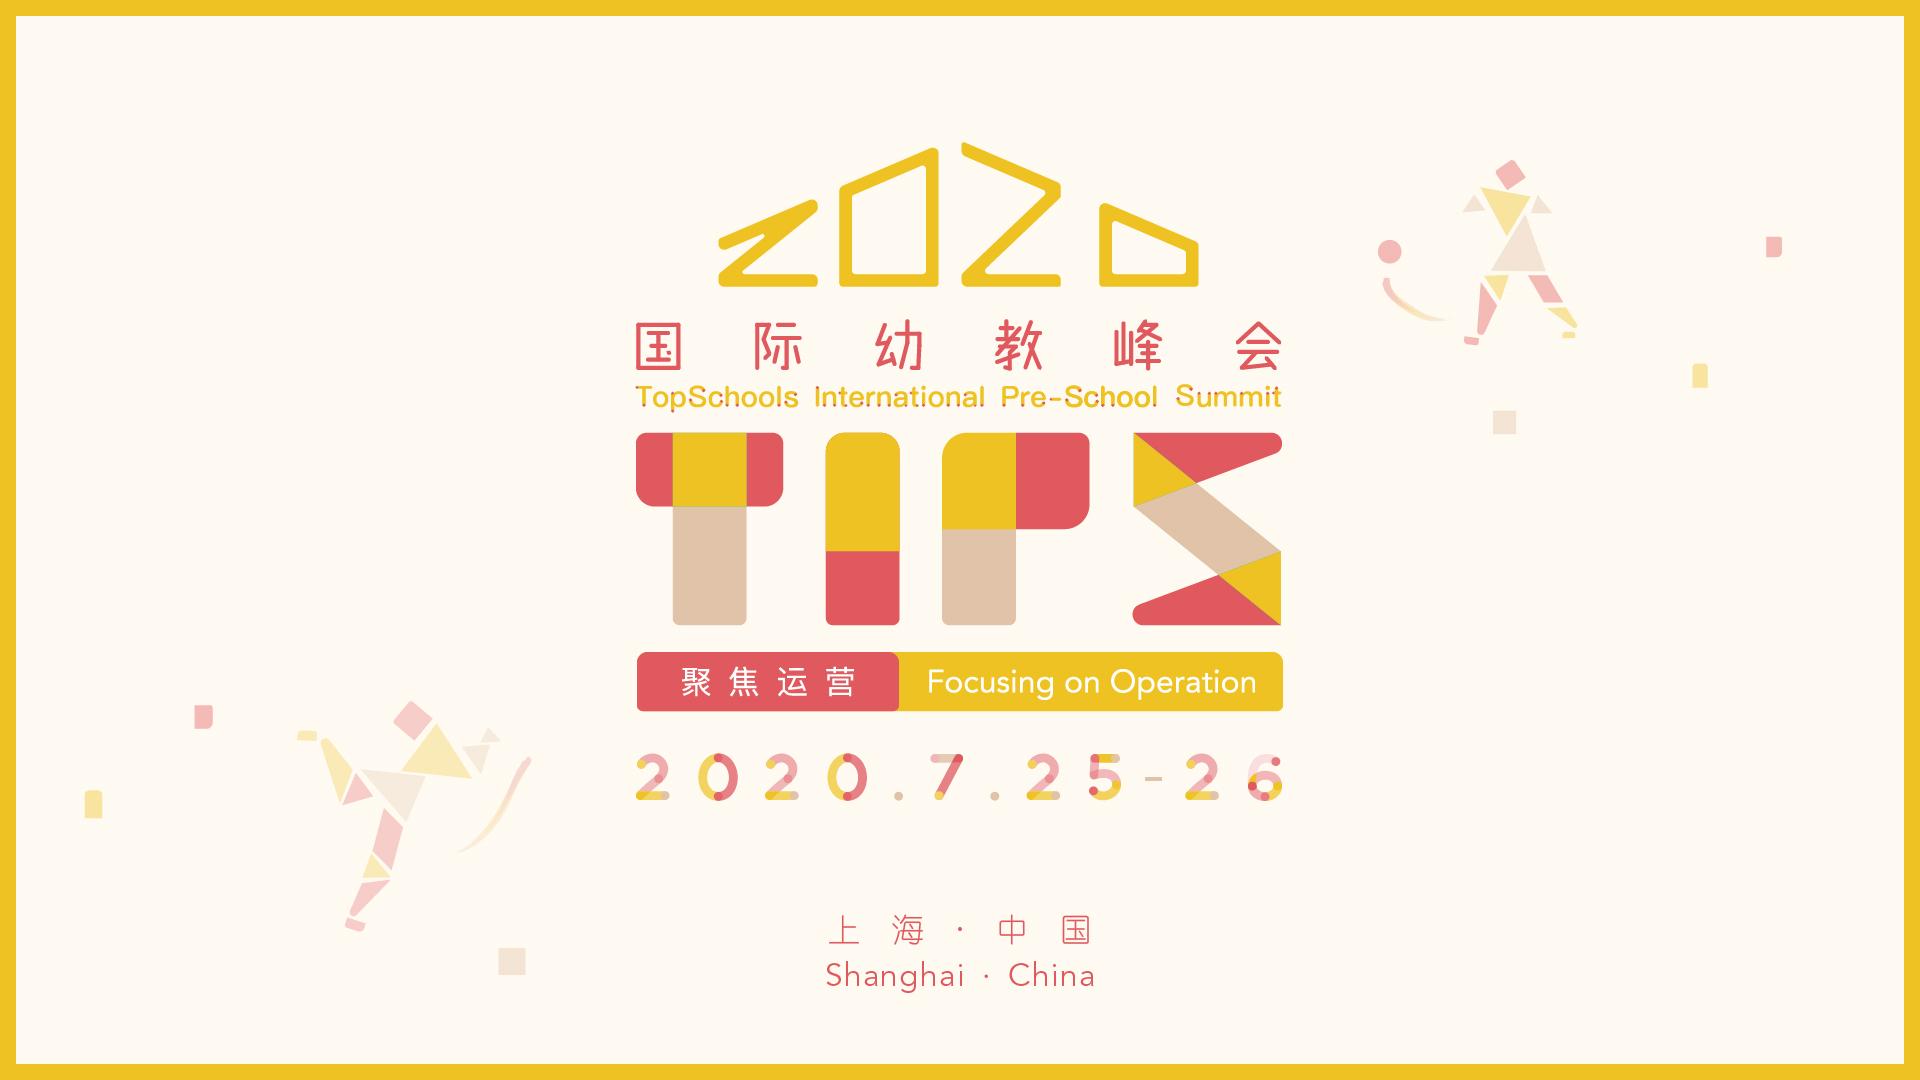 TIPS2020 | 顶思国际幼教峰会